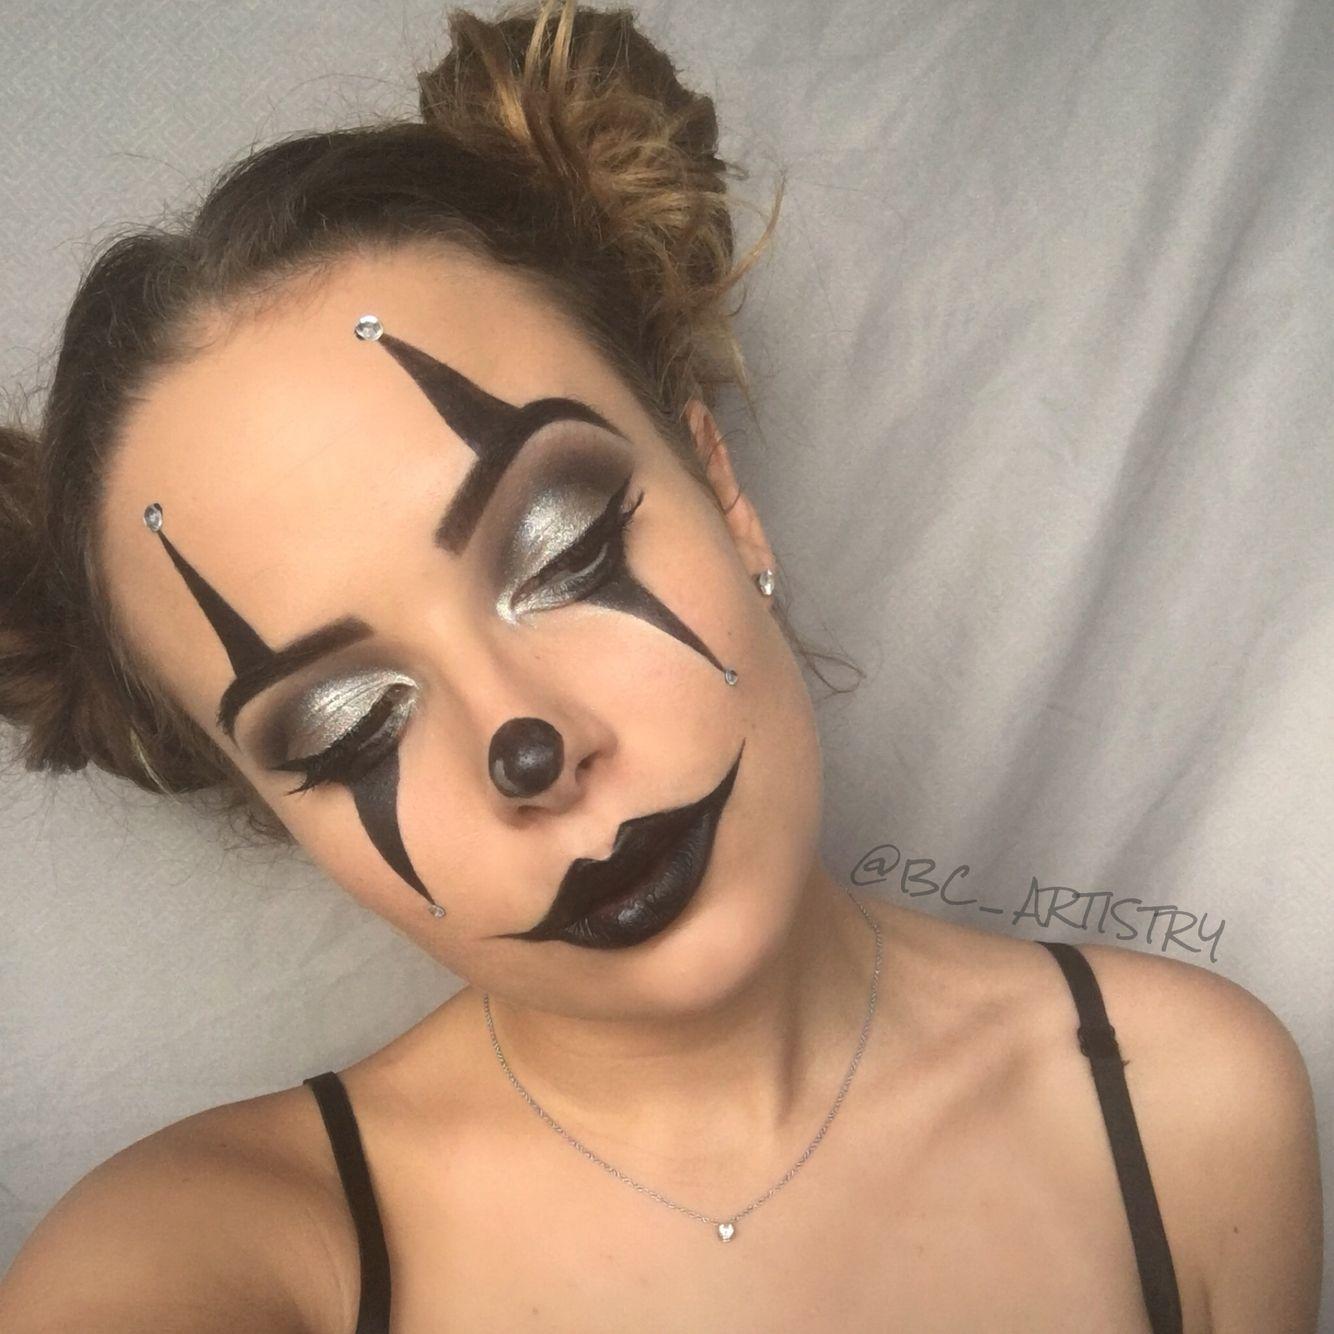 Basic Halloween Makeup Easy.Halloween Makeup Easy Clown Ownercartoon Co